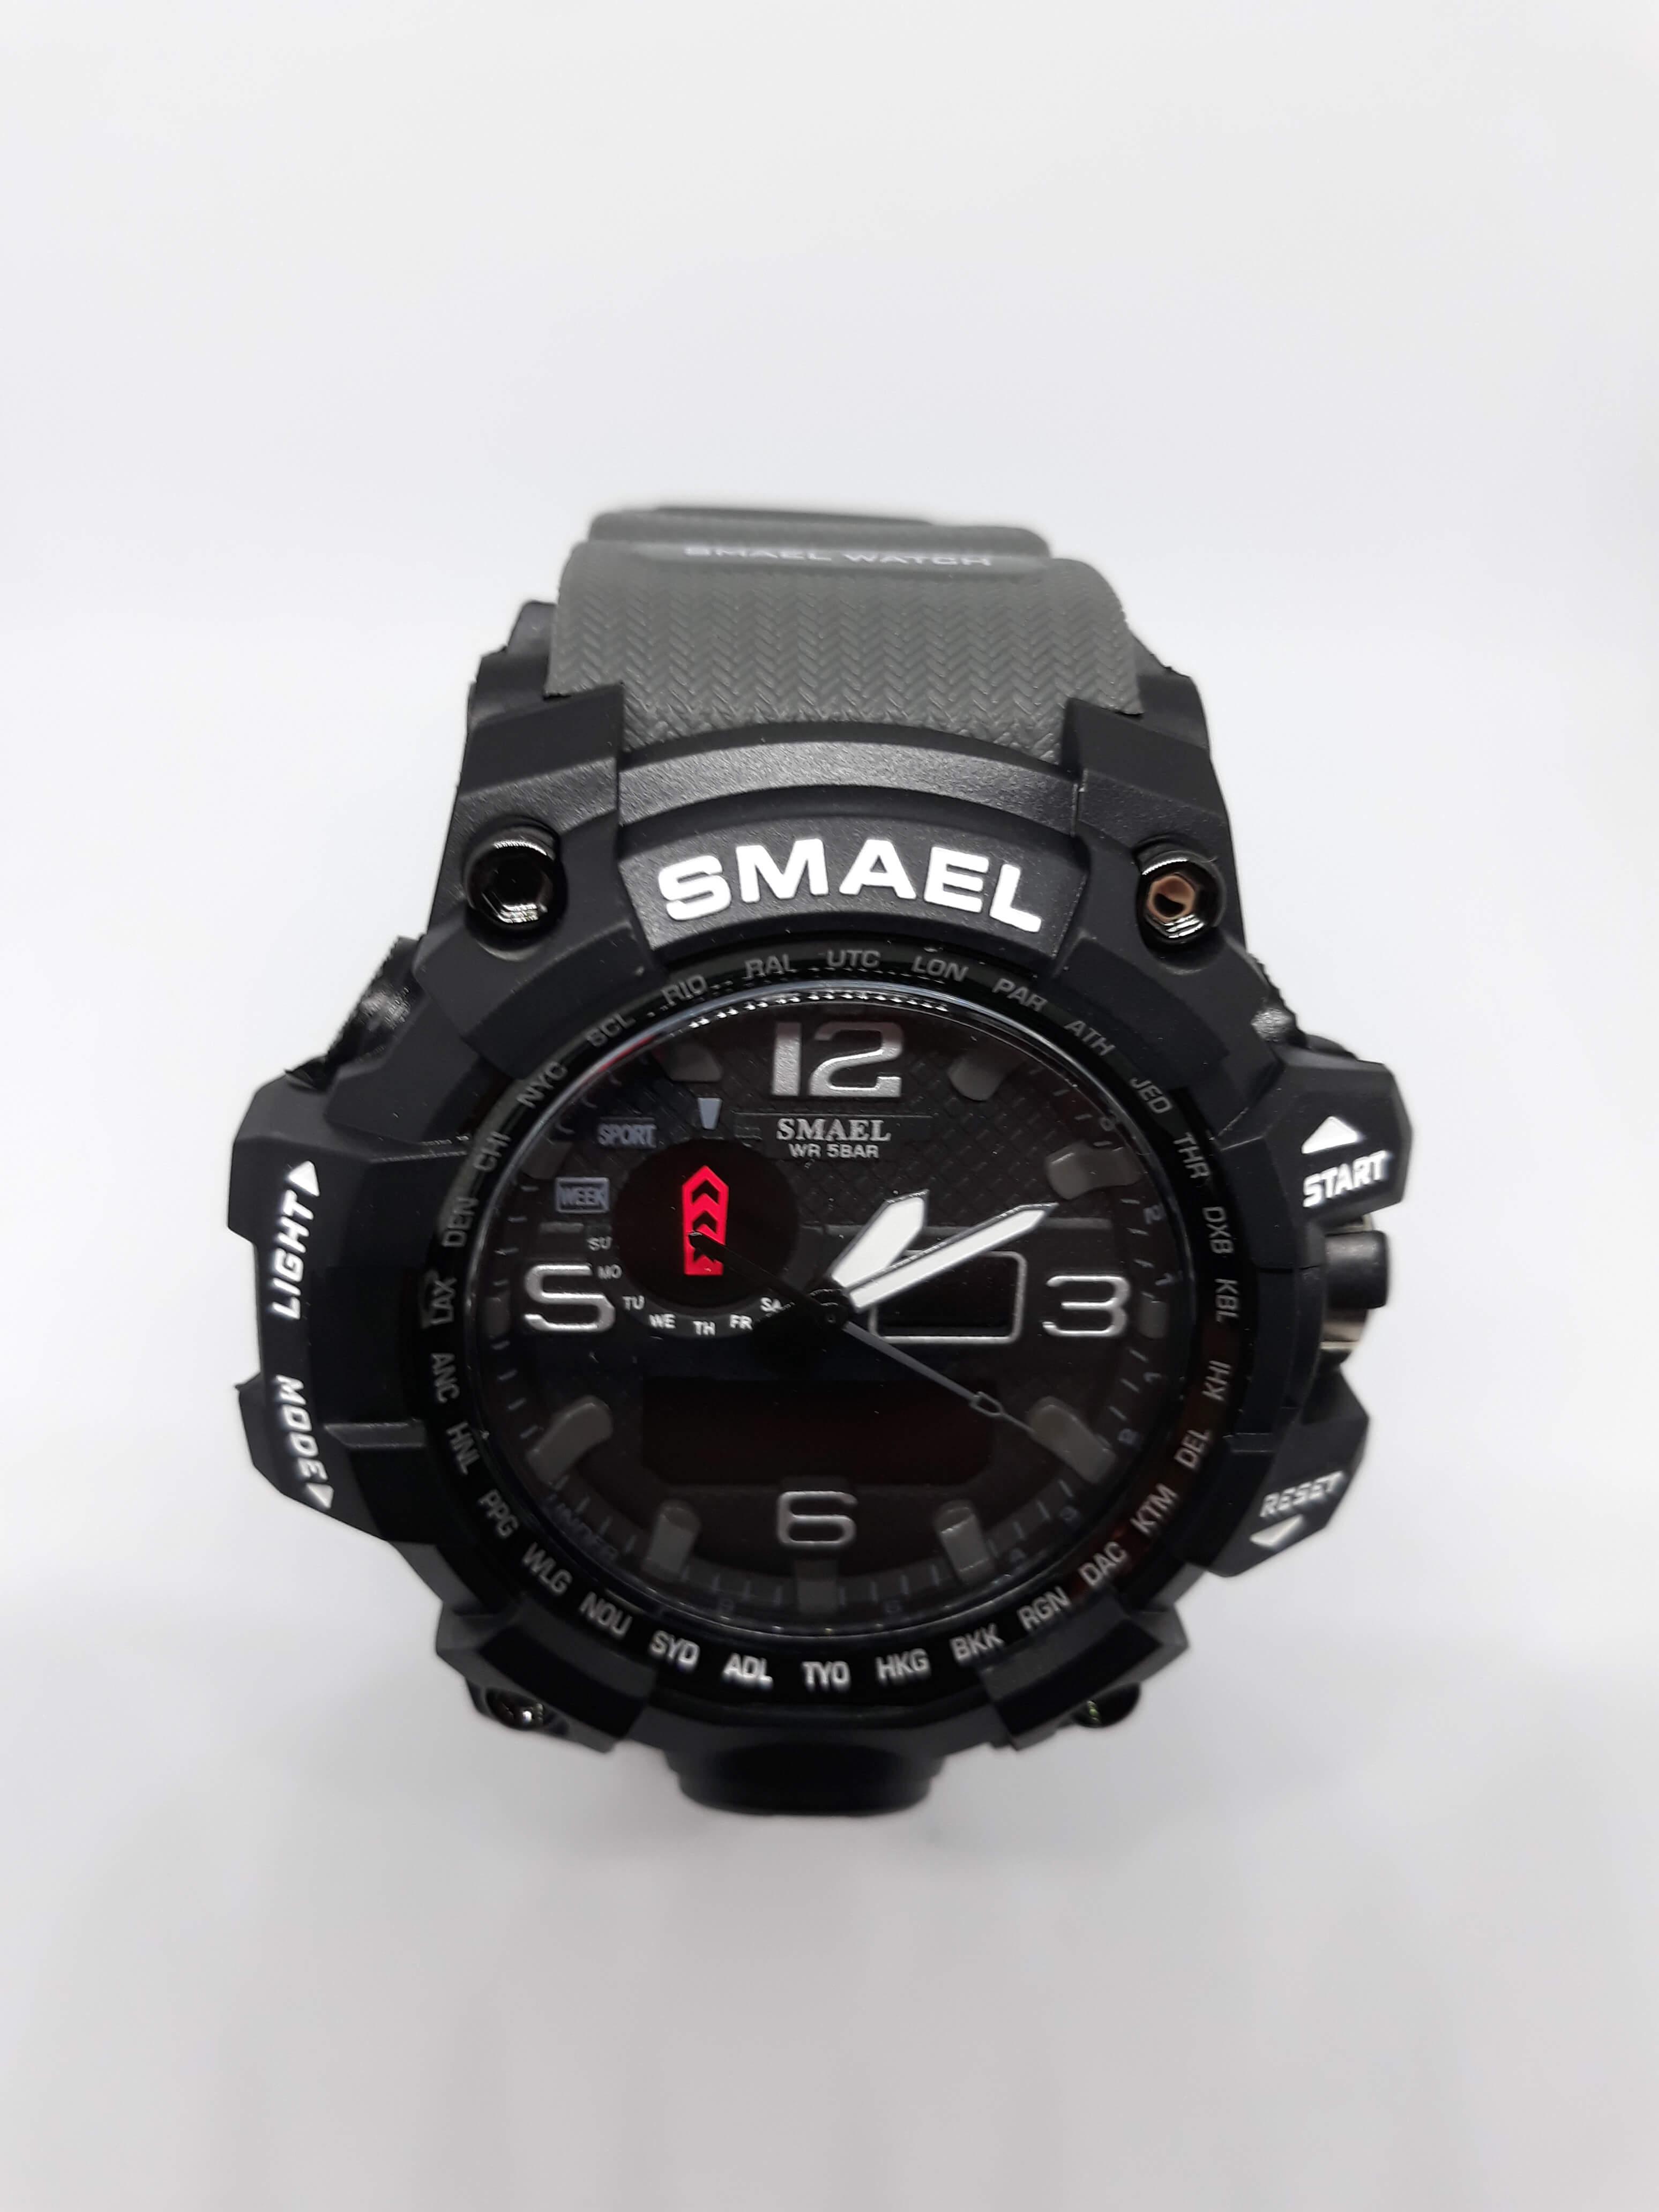 Zegarek Smael Camouflage szary 14